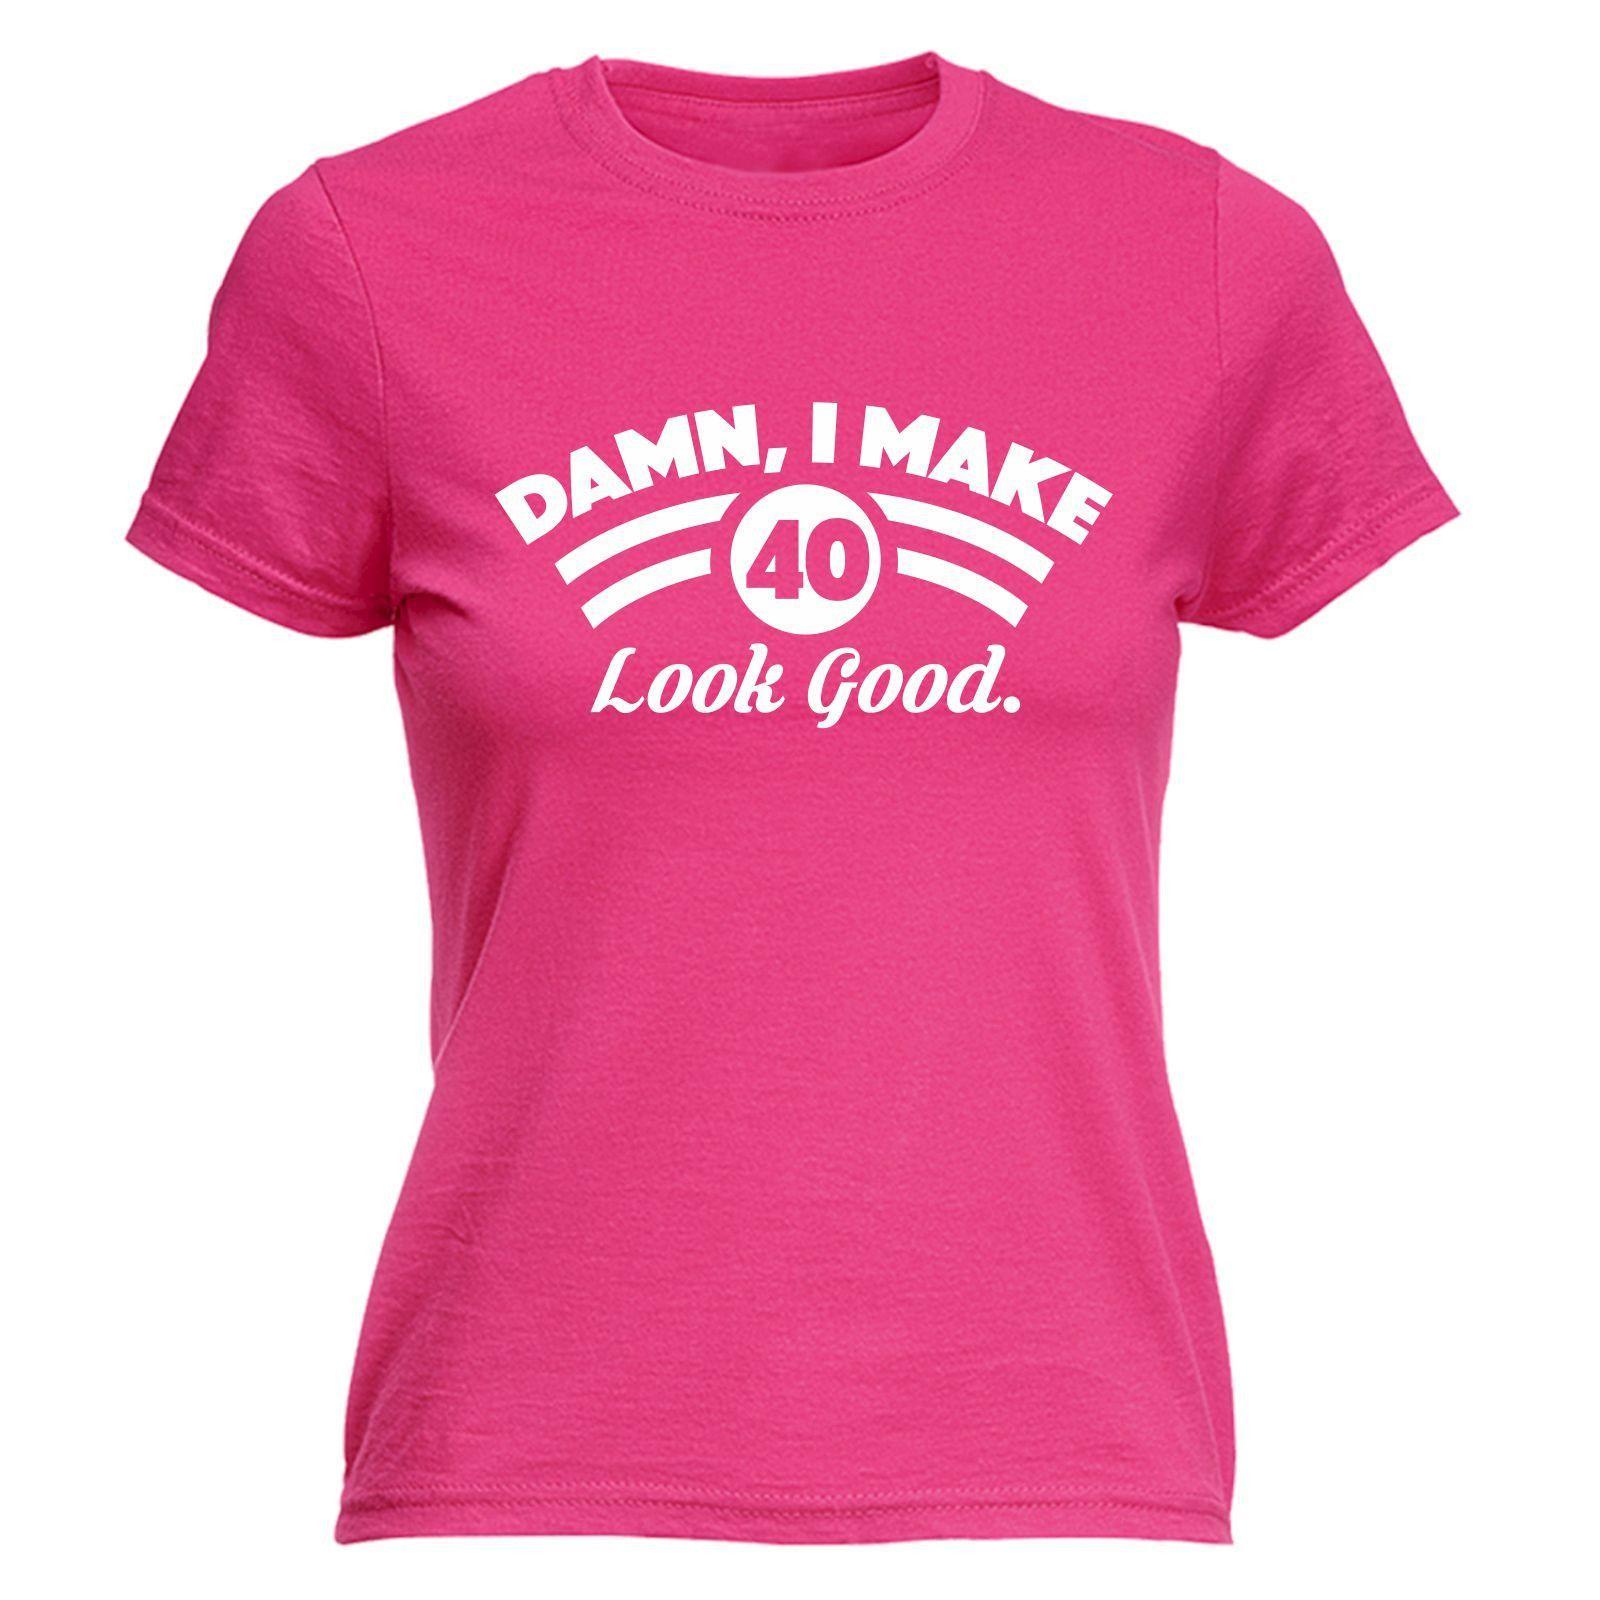 T usa womenus damn i make look good funny tshirt products